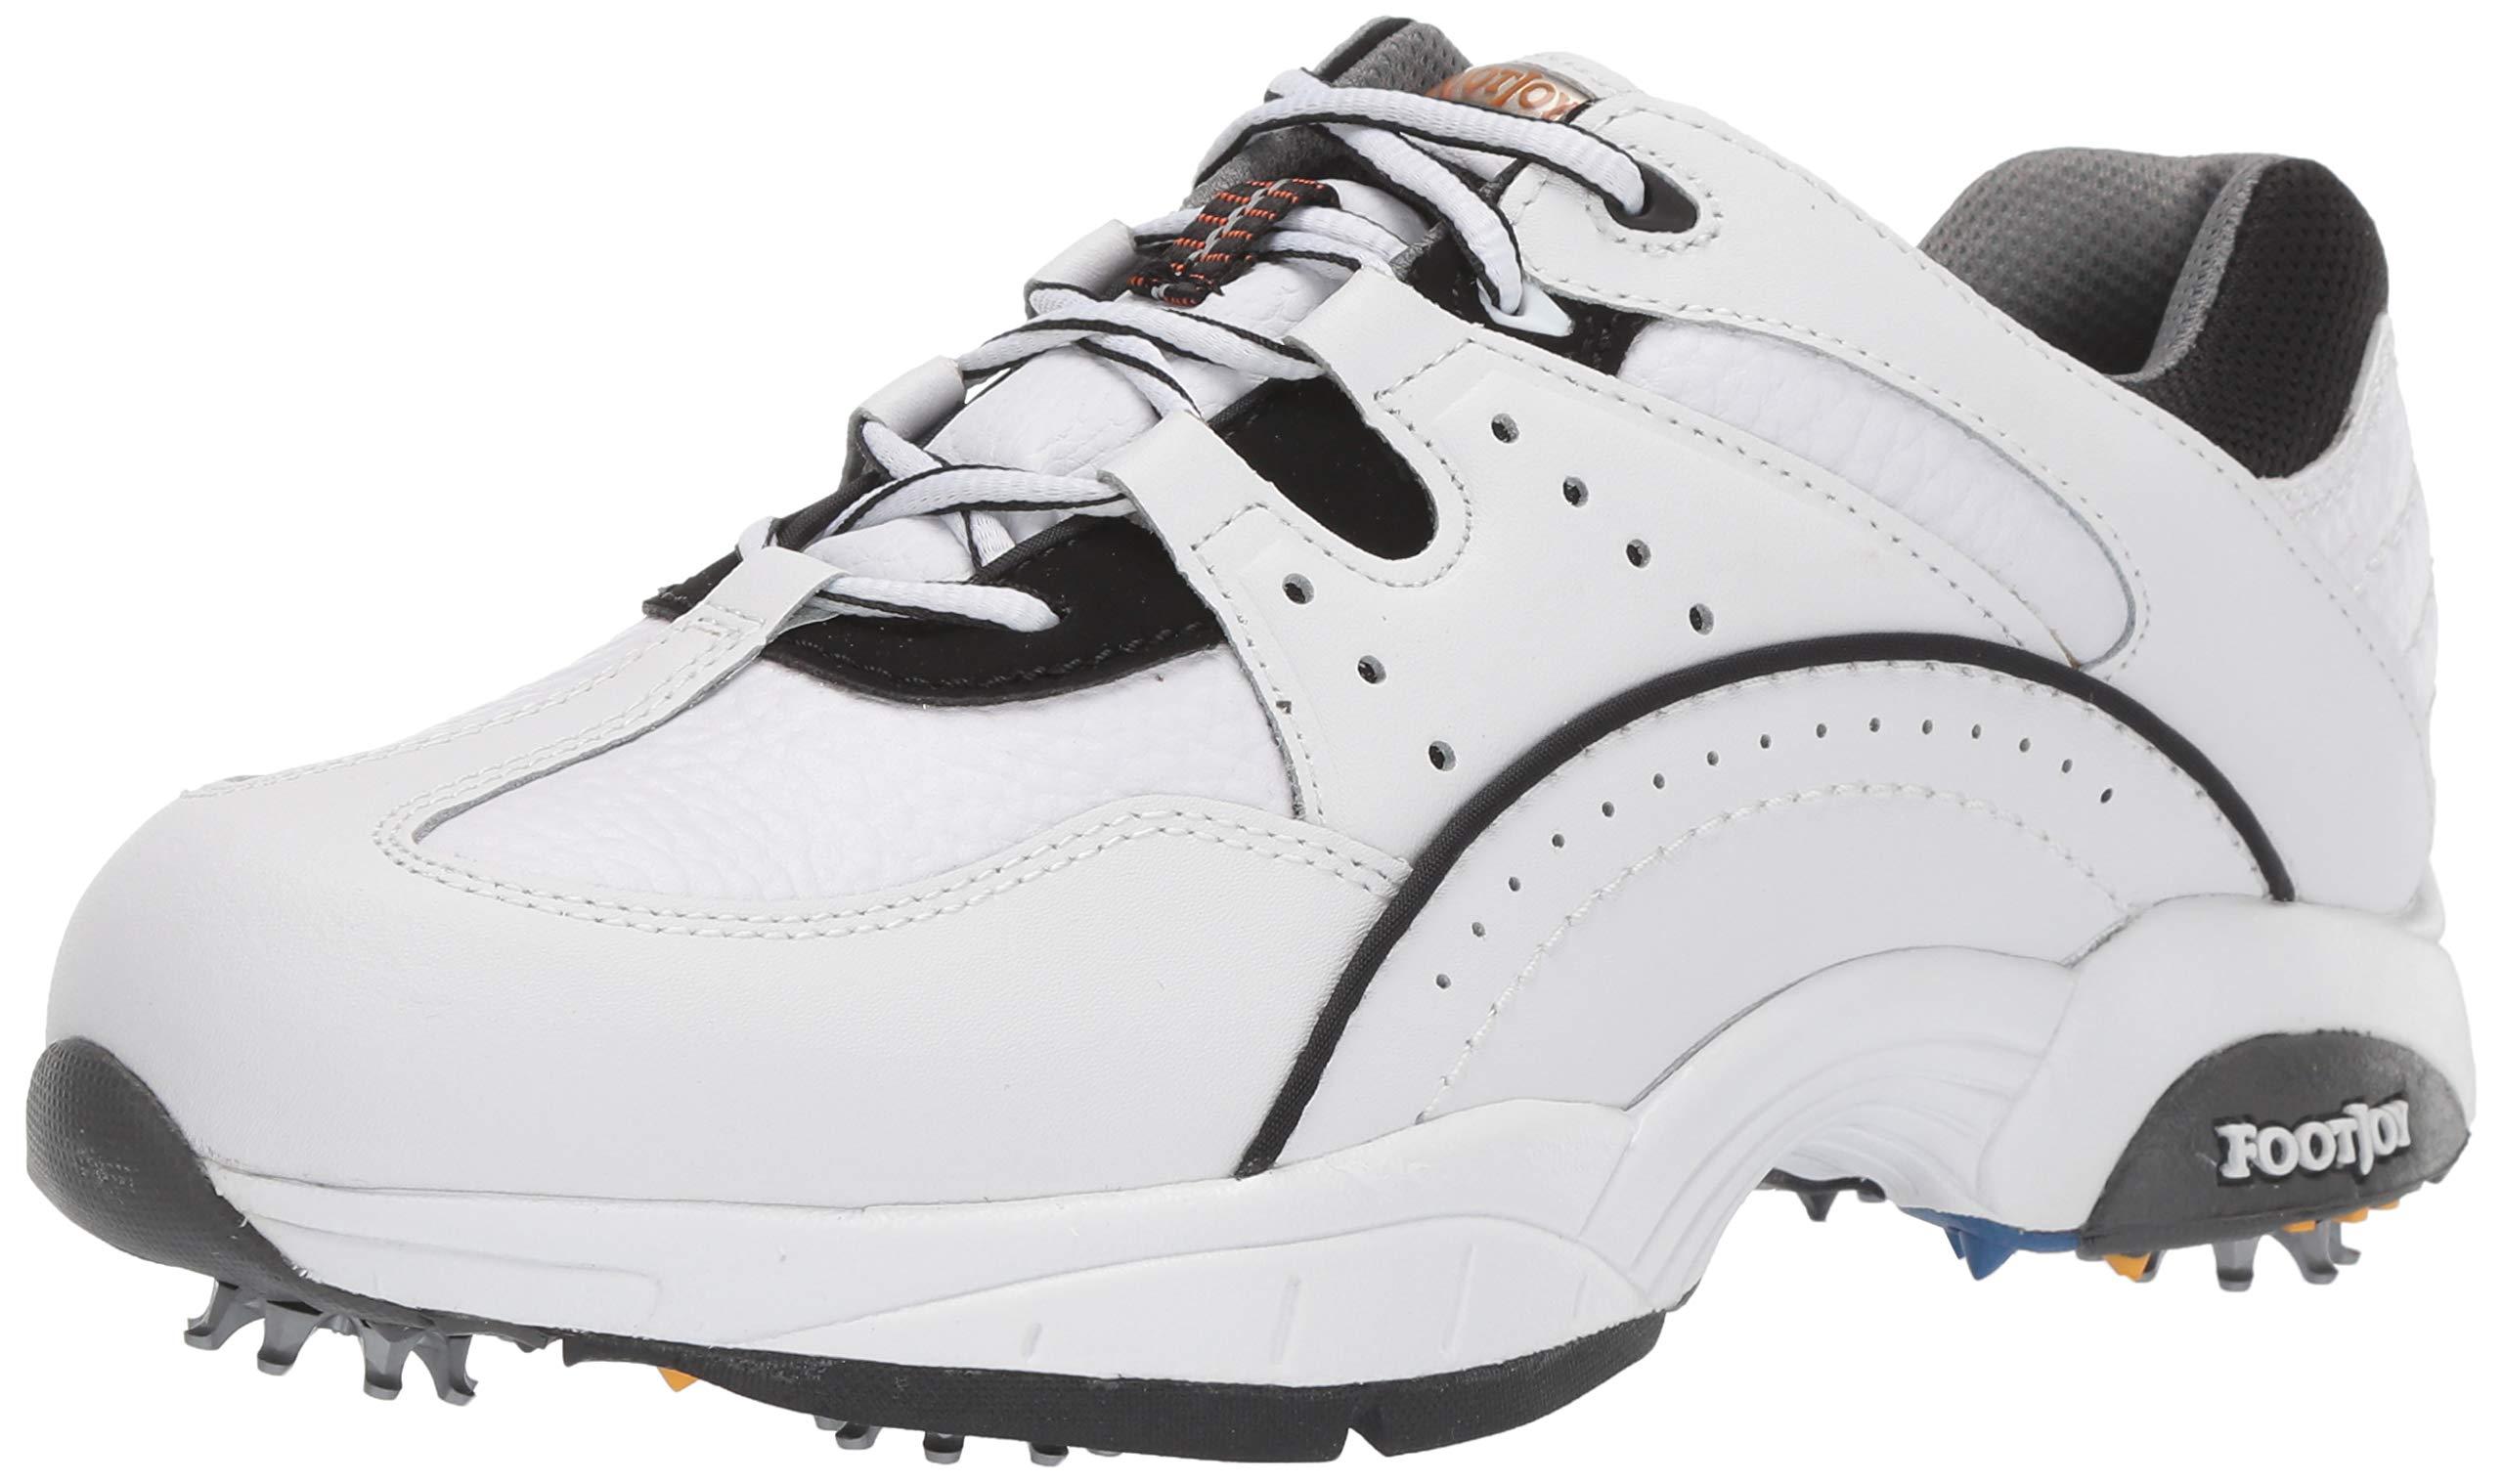 FootJoy Men's Sneaker Golf Shoes White 10.5 W US by FootJoy